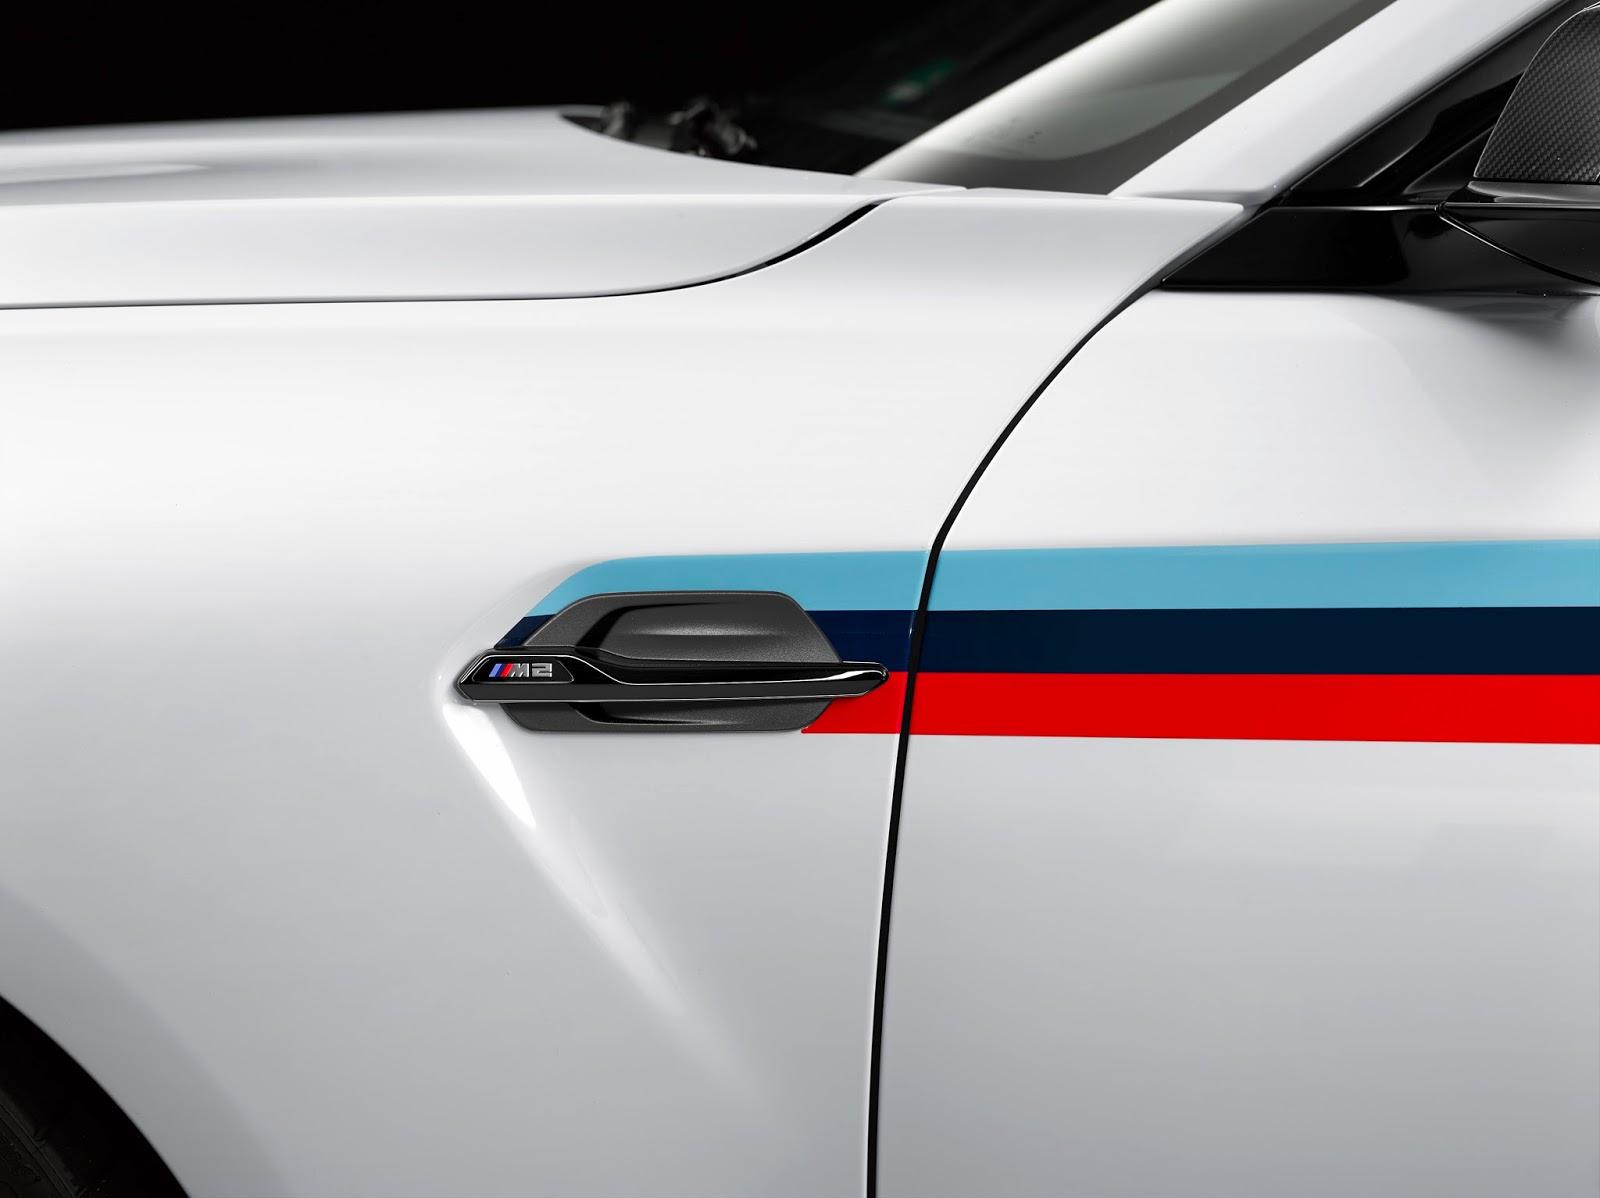 P90203612 highRes bmw m2 coup with bmw Νέα Αξεσουάρ M Performance για τη νέα BMW M2 Coupé. BMW, BMW M2, BMW M2 Coupé, Αξεσουάρ